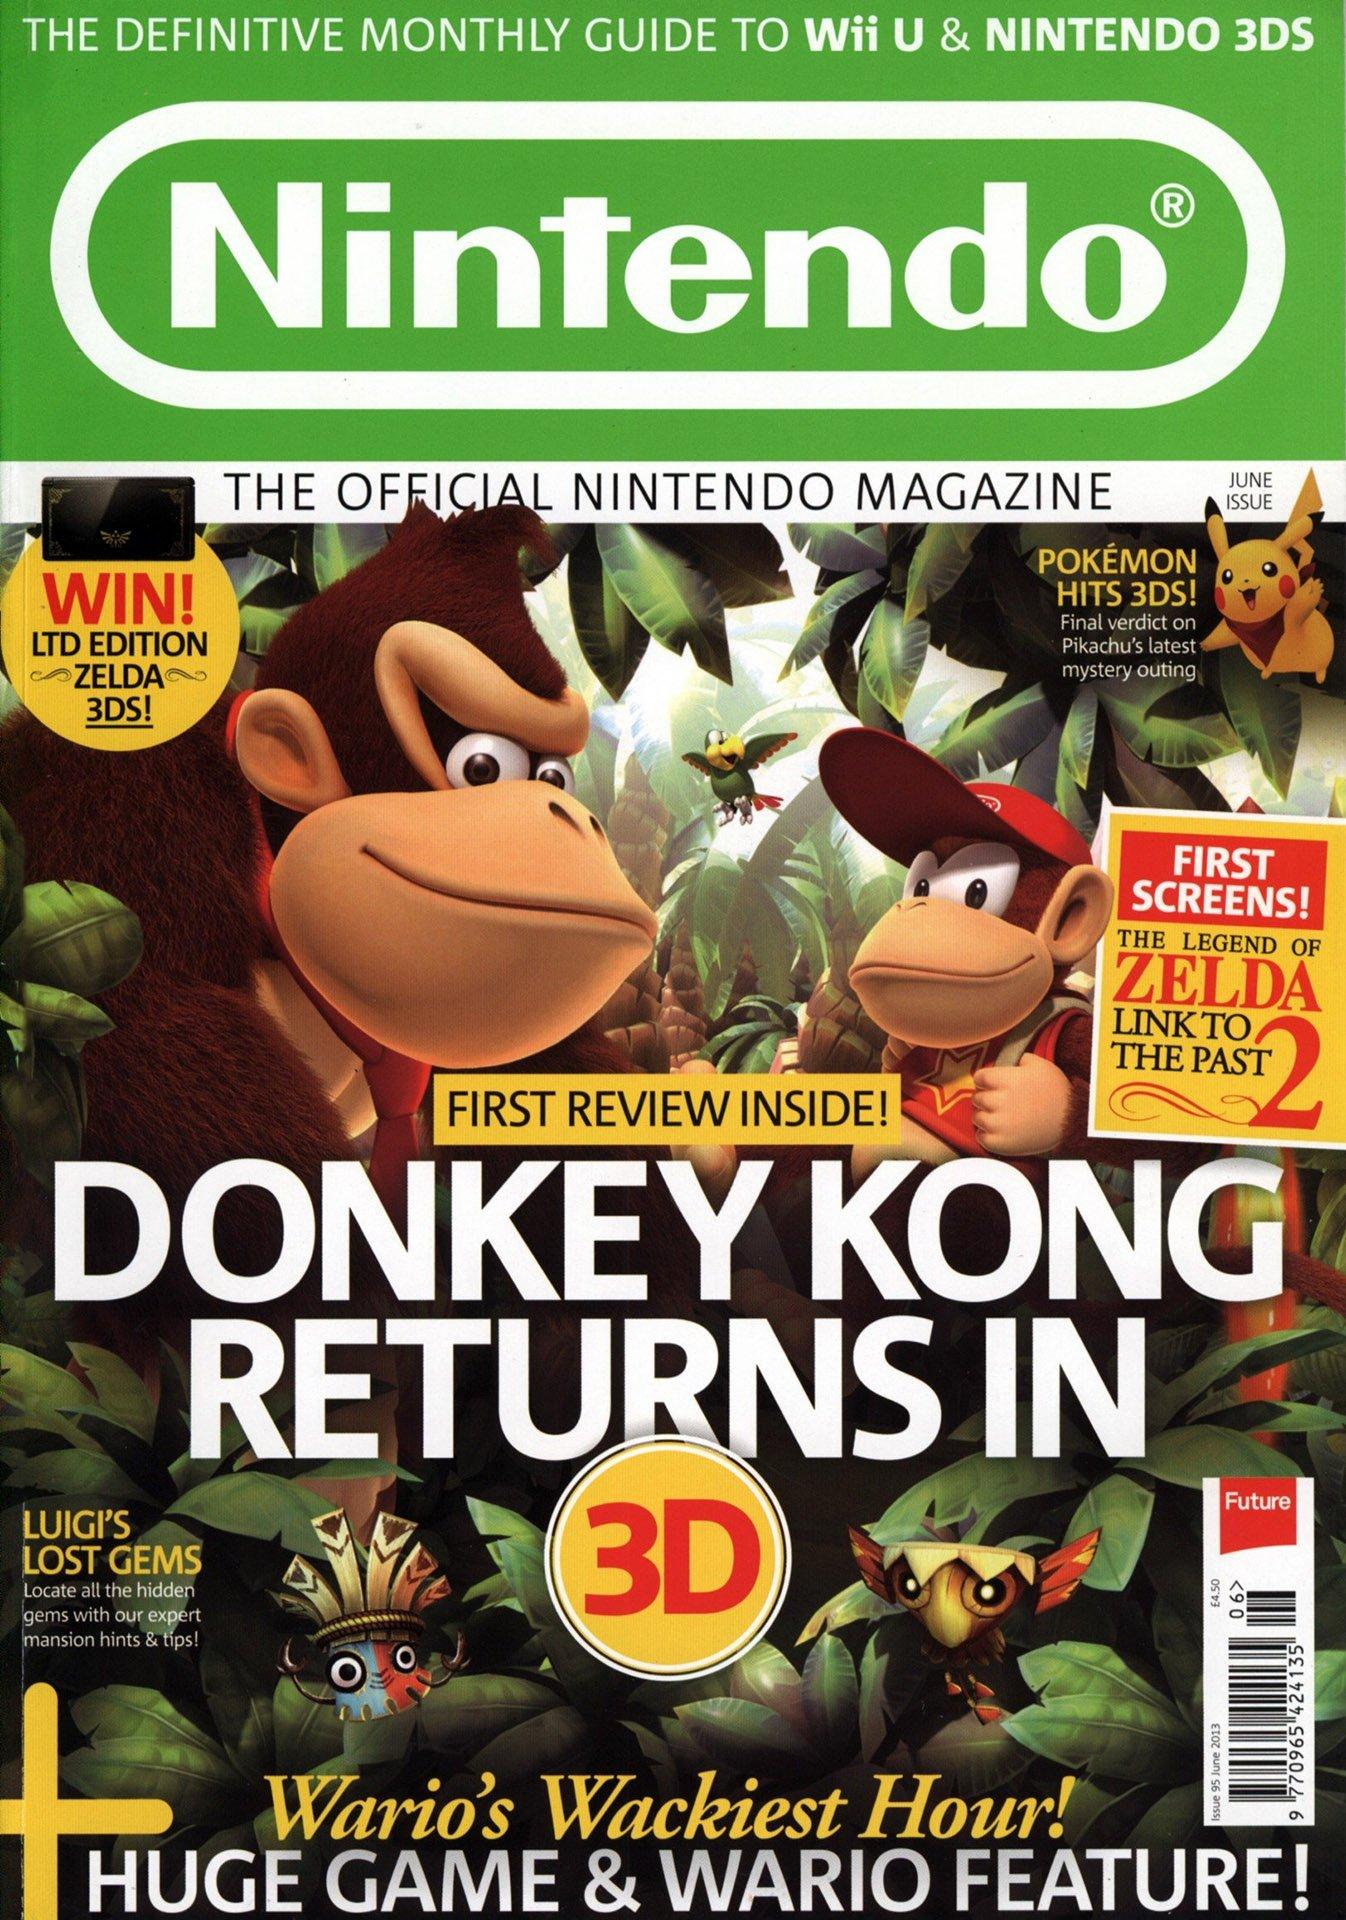 Official Nintendo Magazine 095 (June 2013)